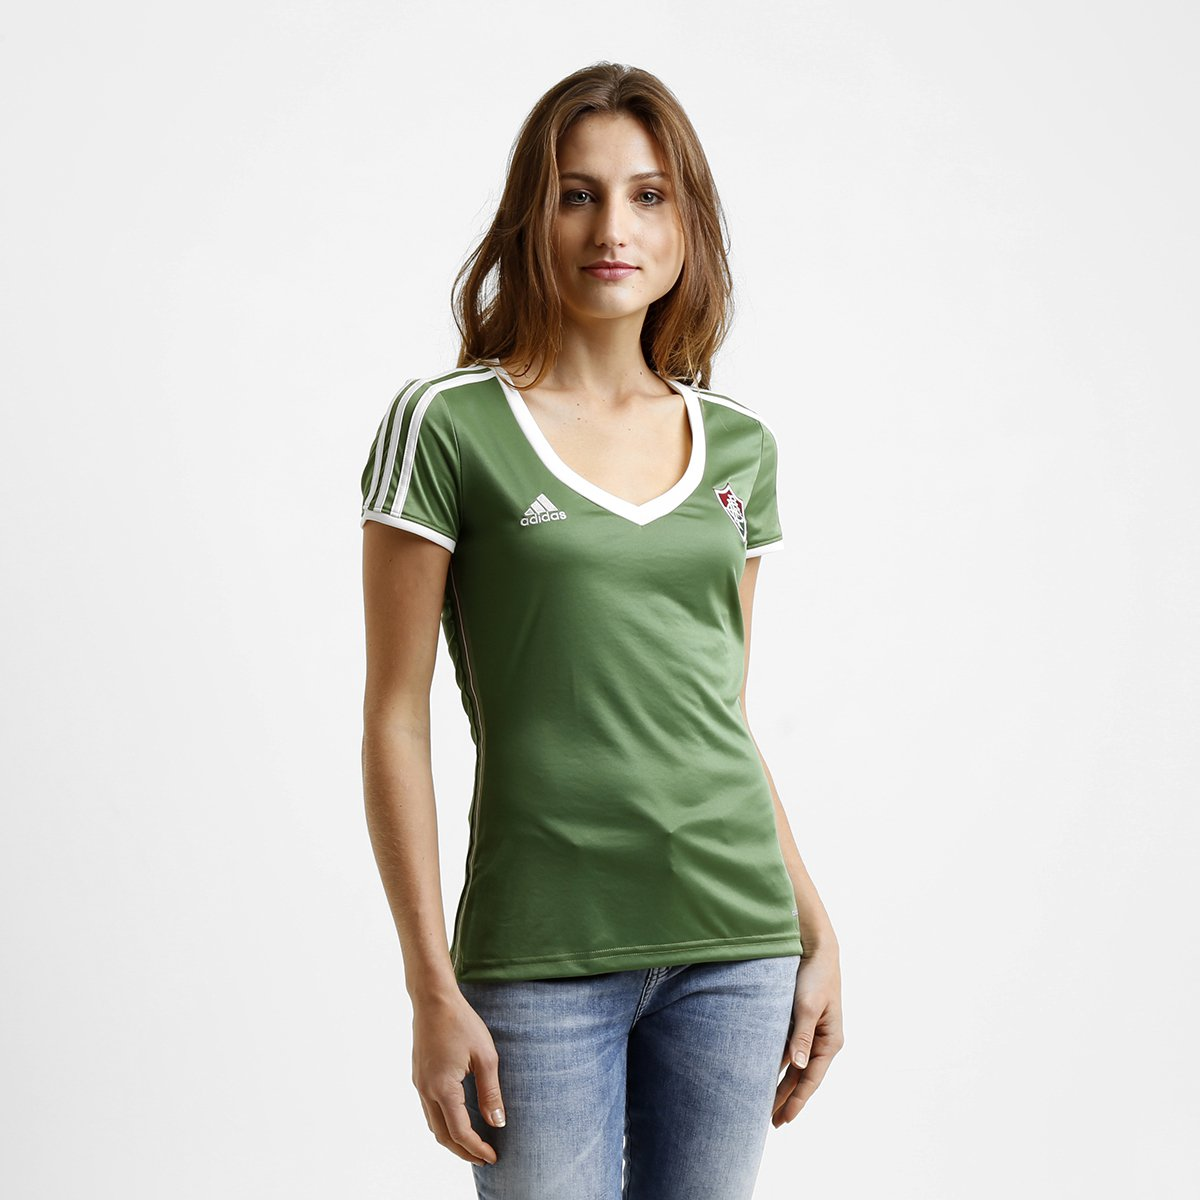 Camisa Fluminense III 2015 s nº Torcedor Adidas Feminina - Compre Agora  4202846a98086